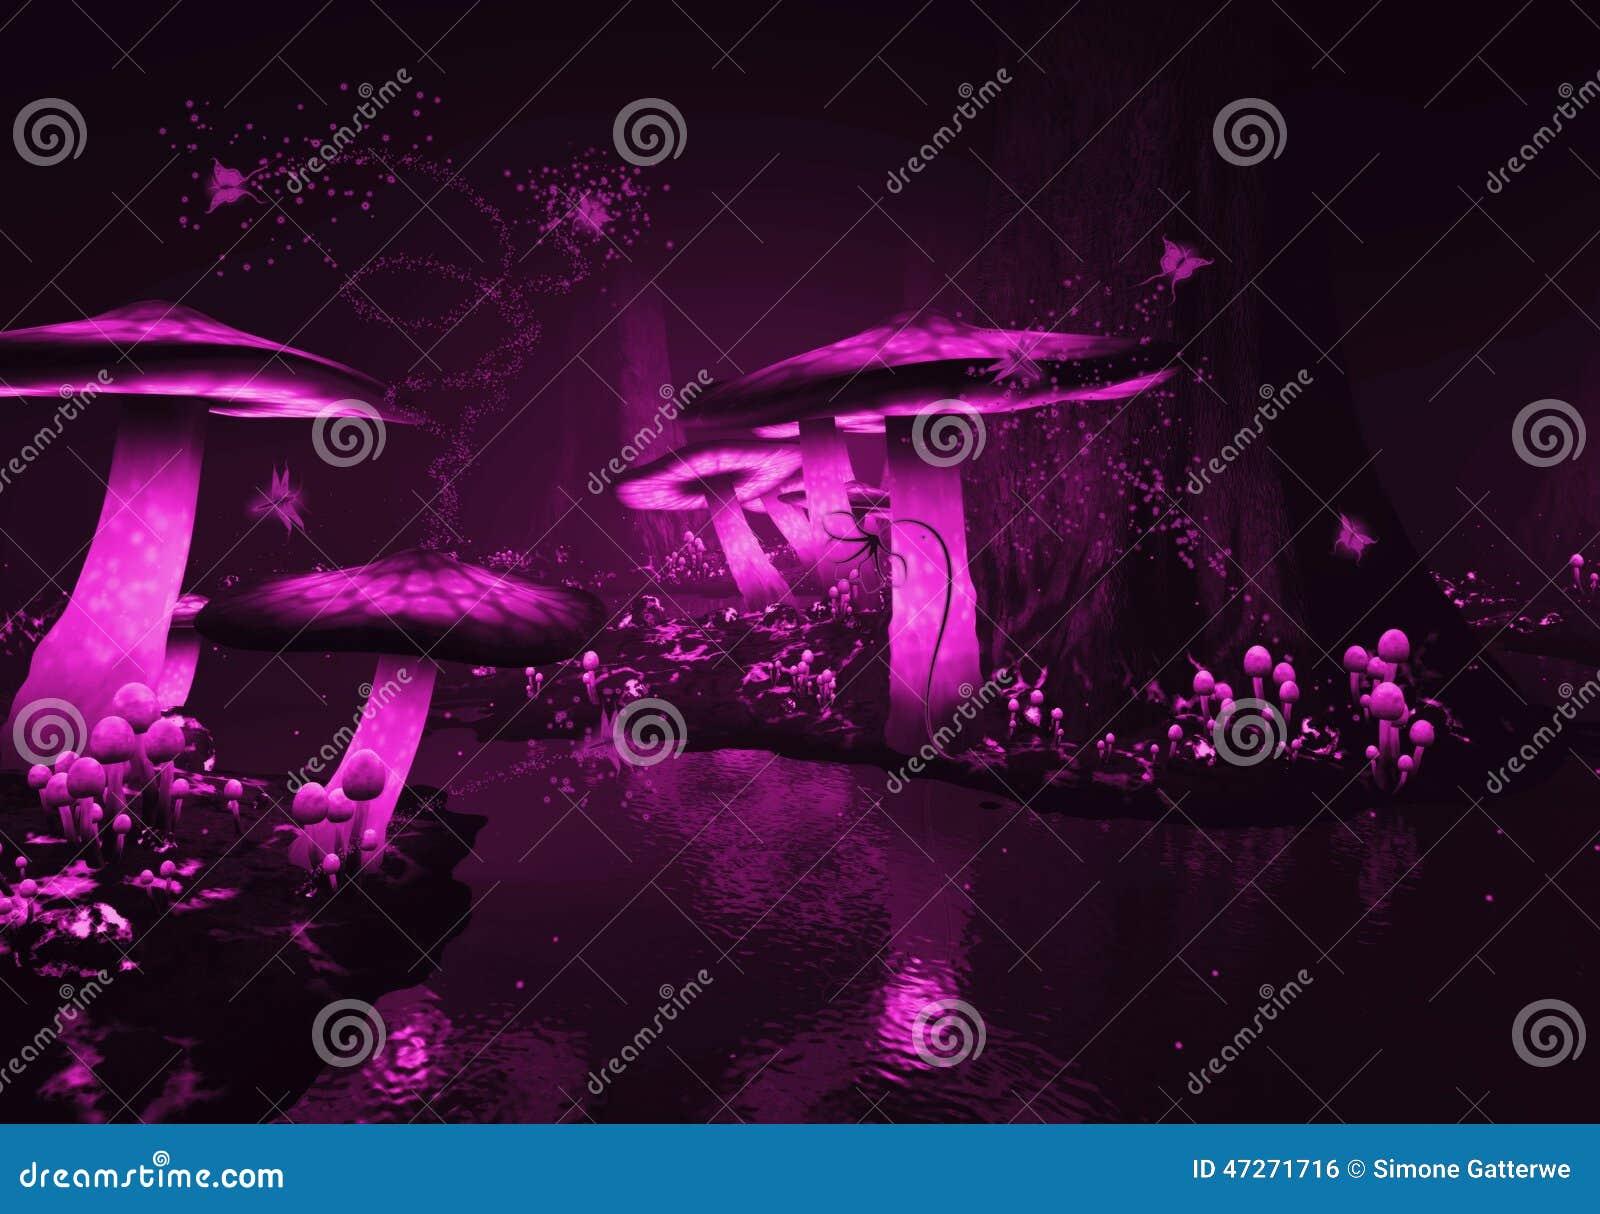 Rozjarzone purpur pieczarki